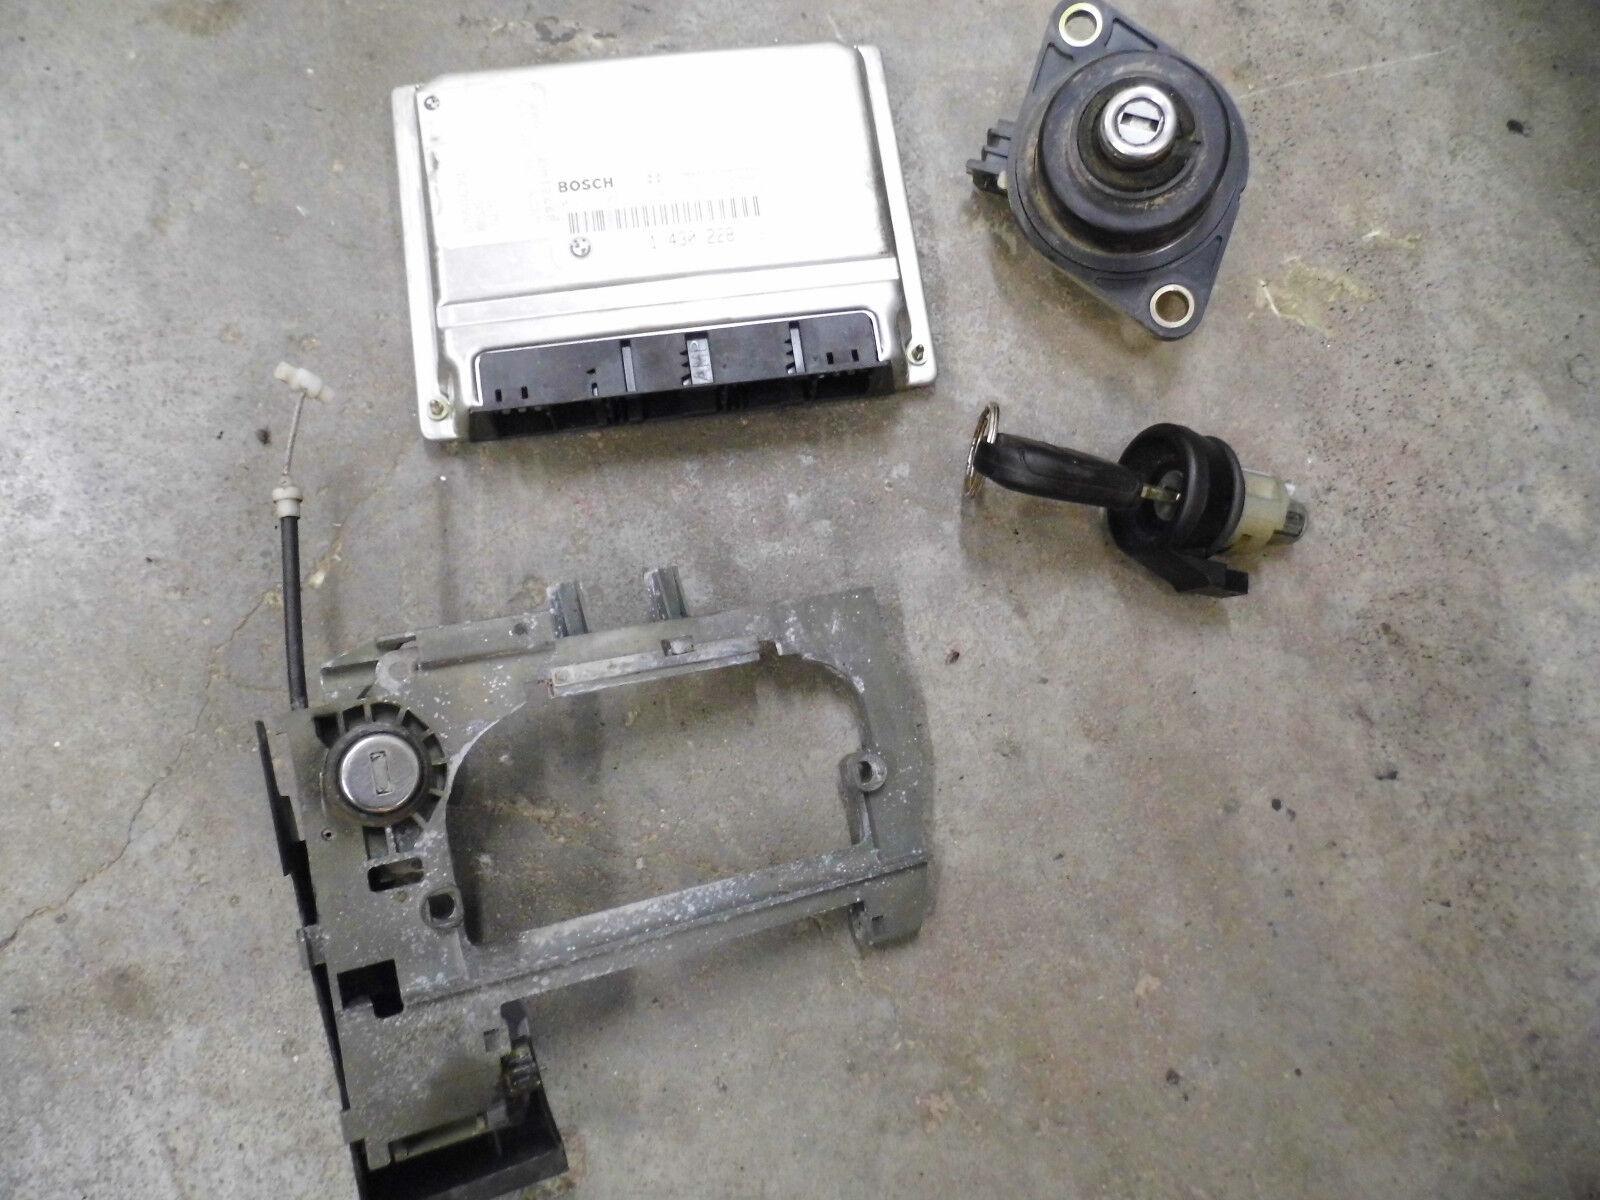 Used Bmw 740i Engine Computers For Sale E38 Dme Wiring 740il E39 540i Oem Ecu Key Tumbler Door Trunk Lock